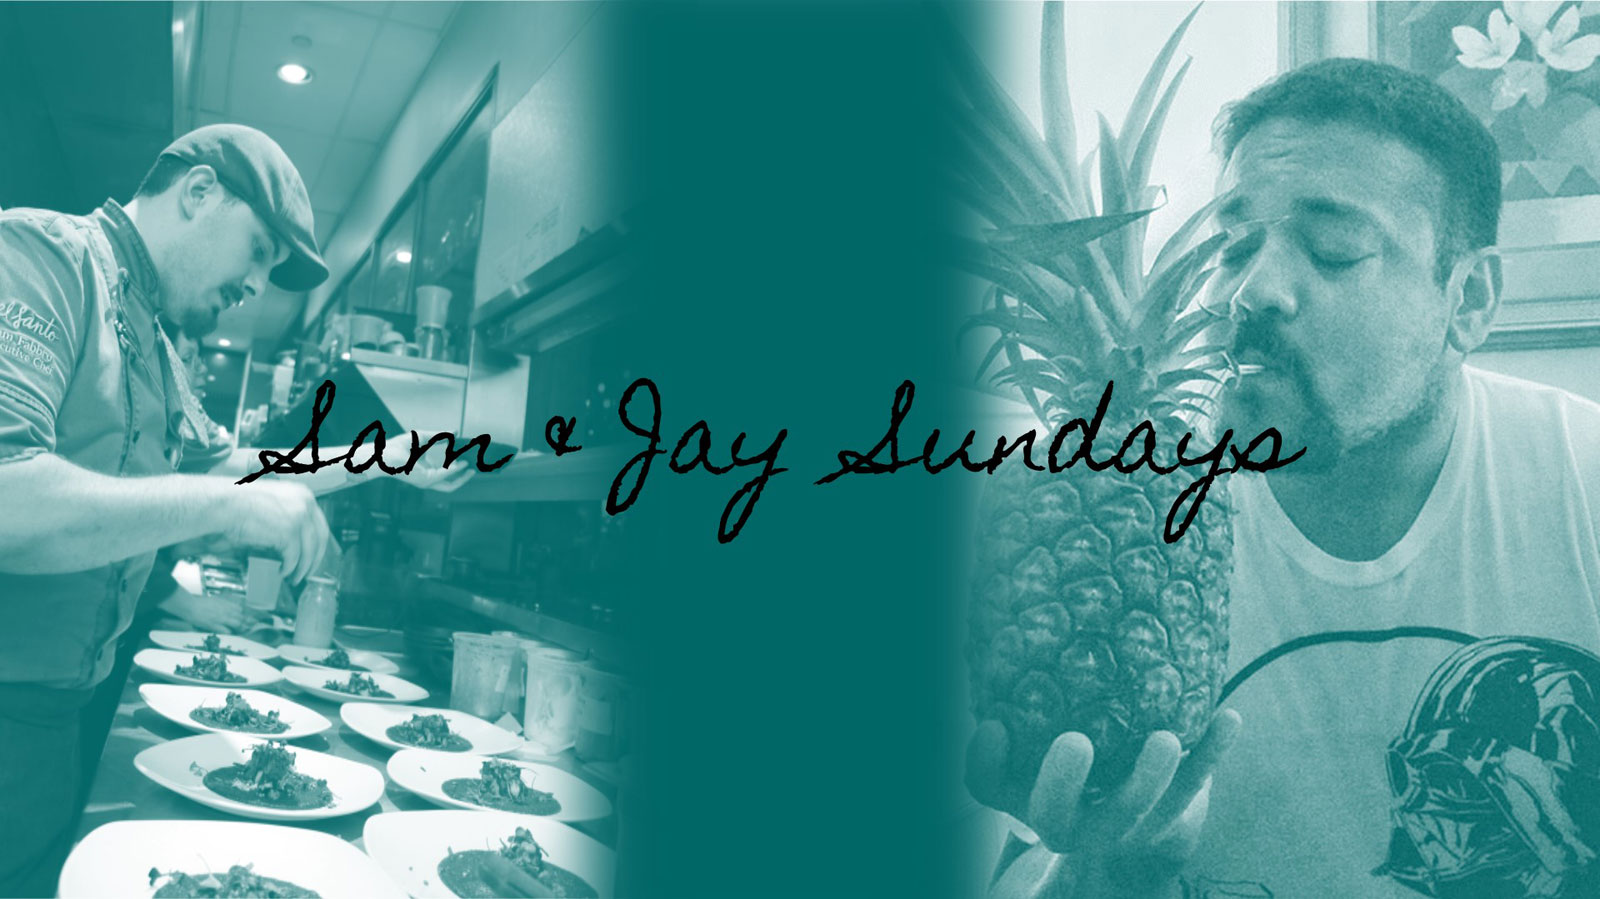 'Sam & Jay Sundays' Launching This Weekend at El Santo